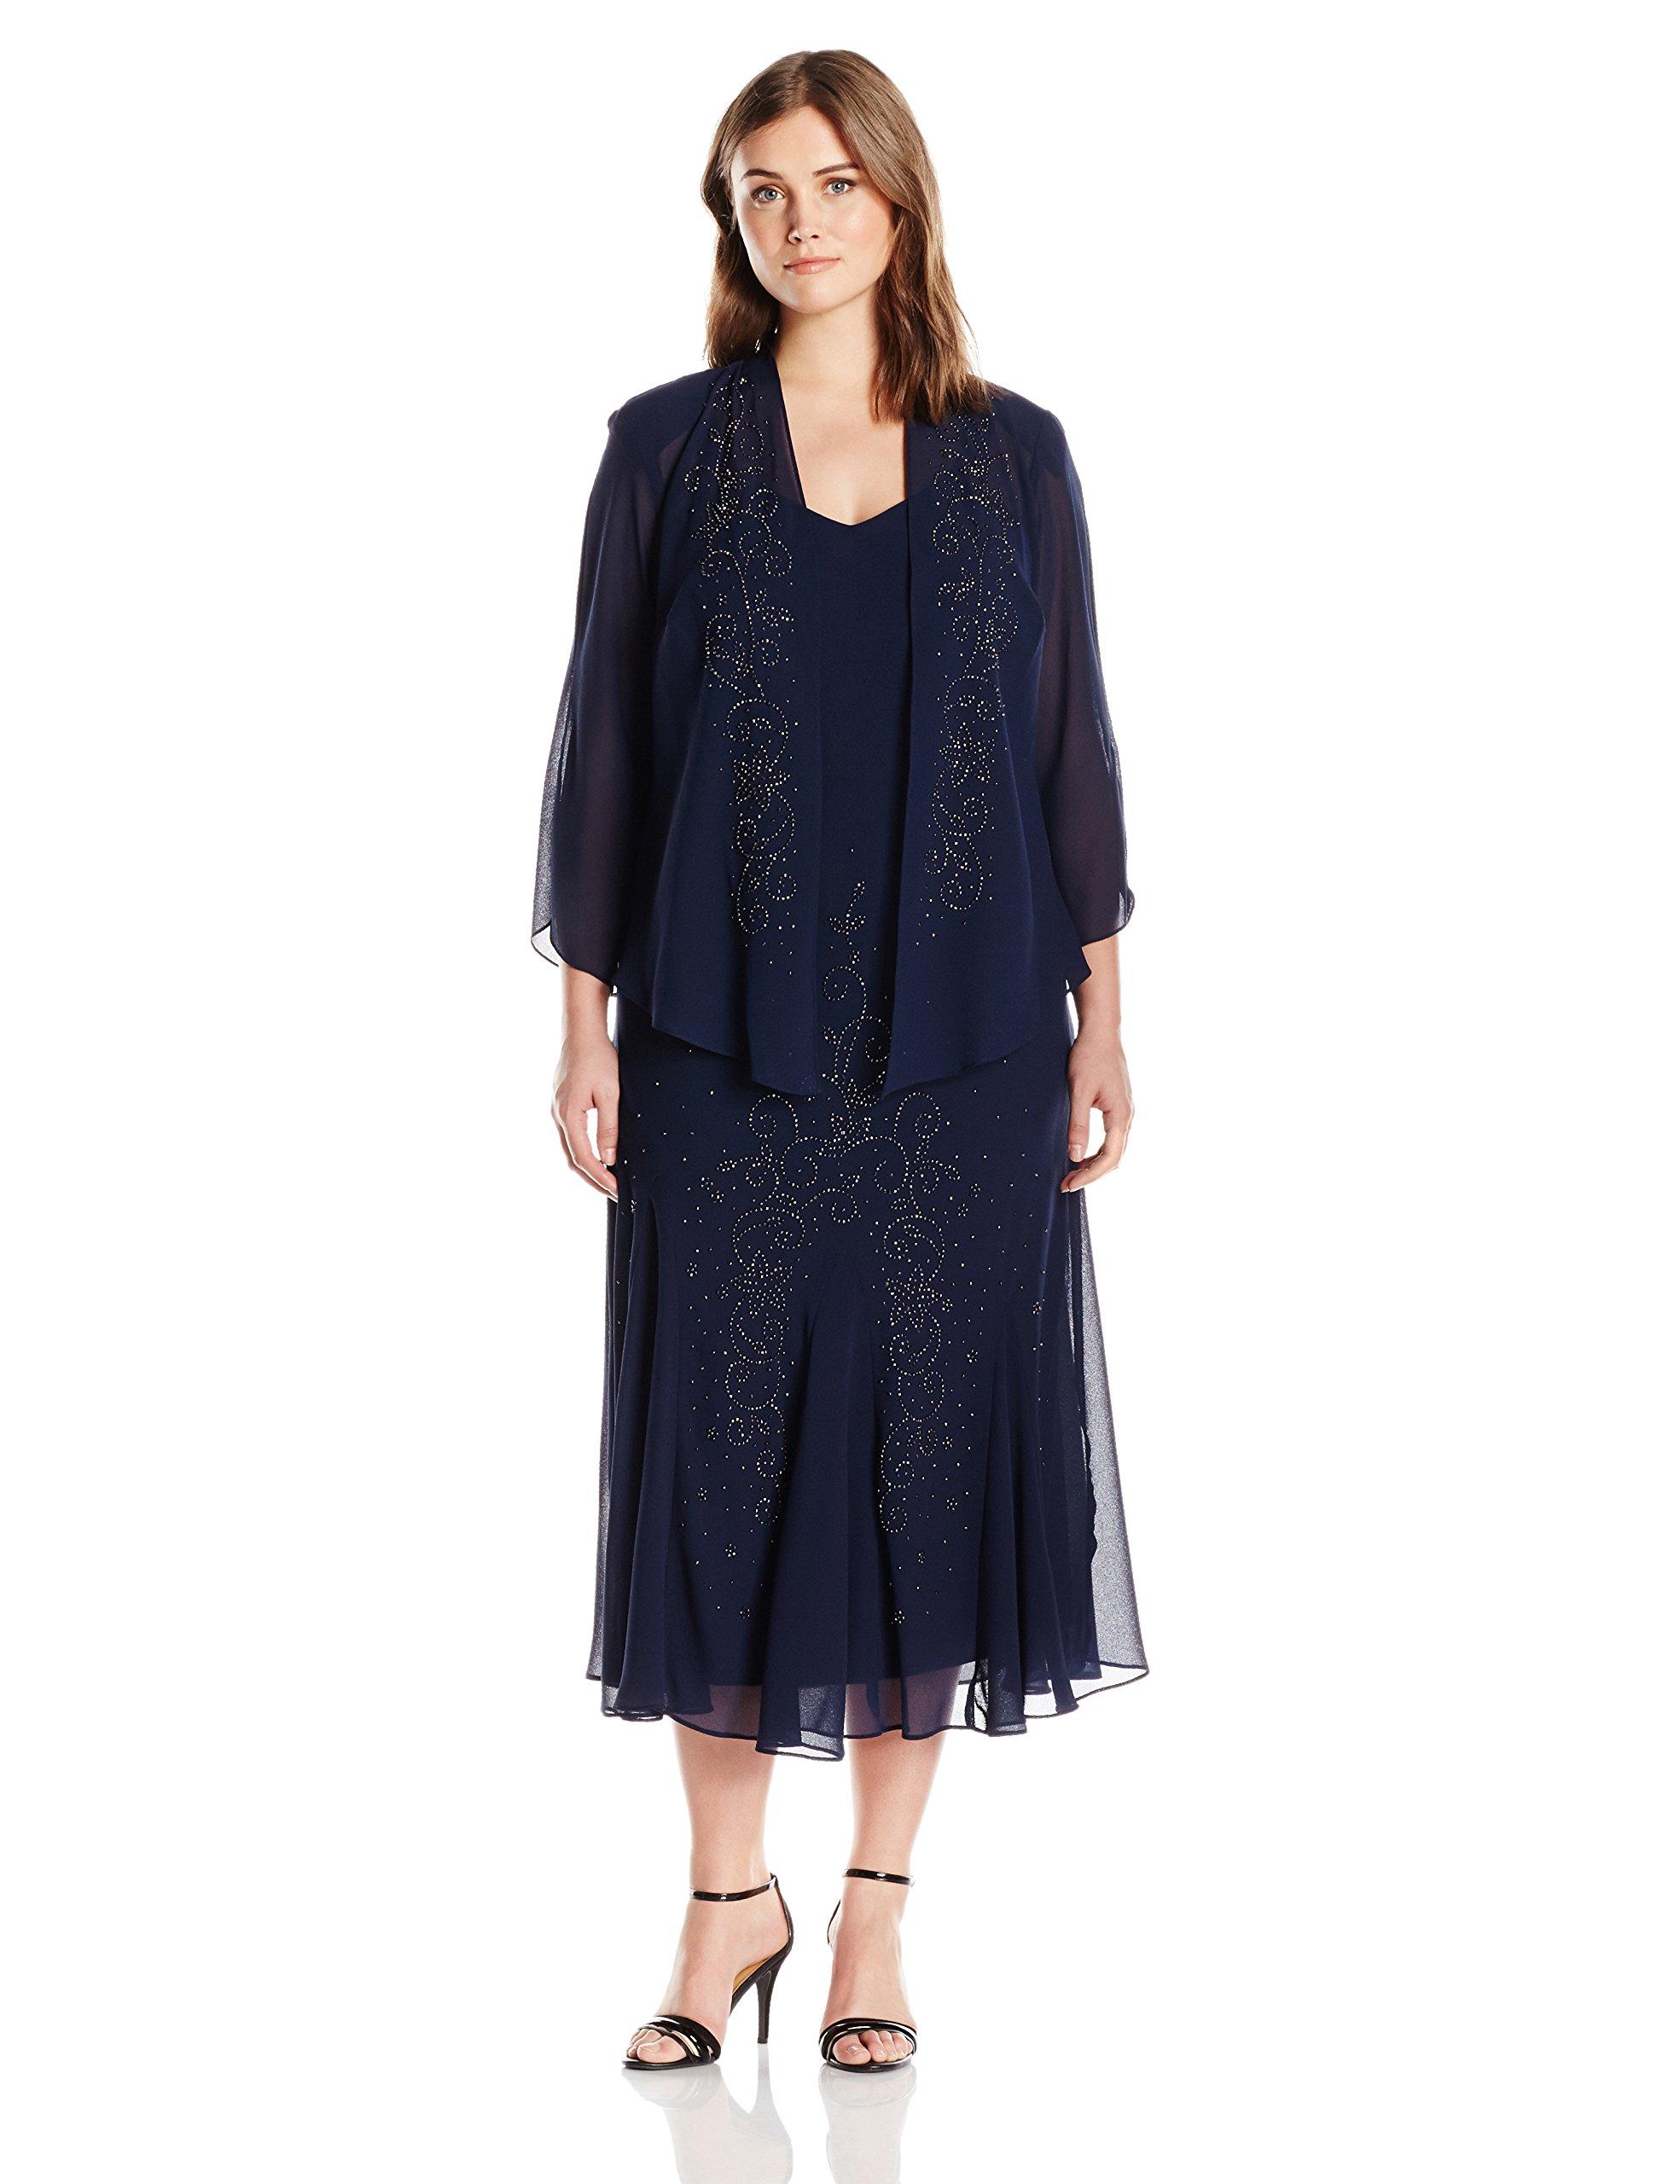 e8b42e23dd13 ... Richards R M Richards Women s Plus Size Beaded Chiffon Jacket Dress